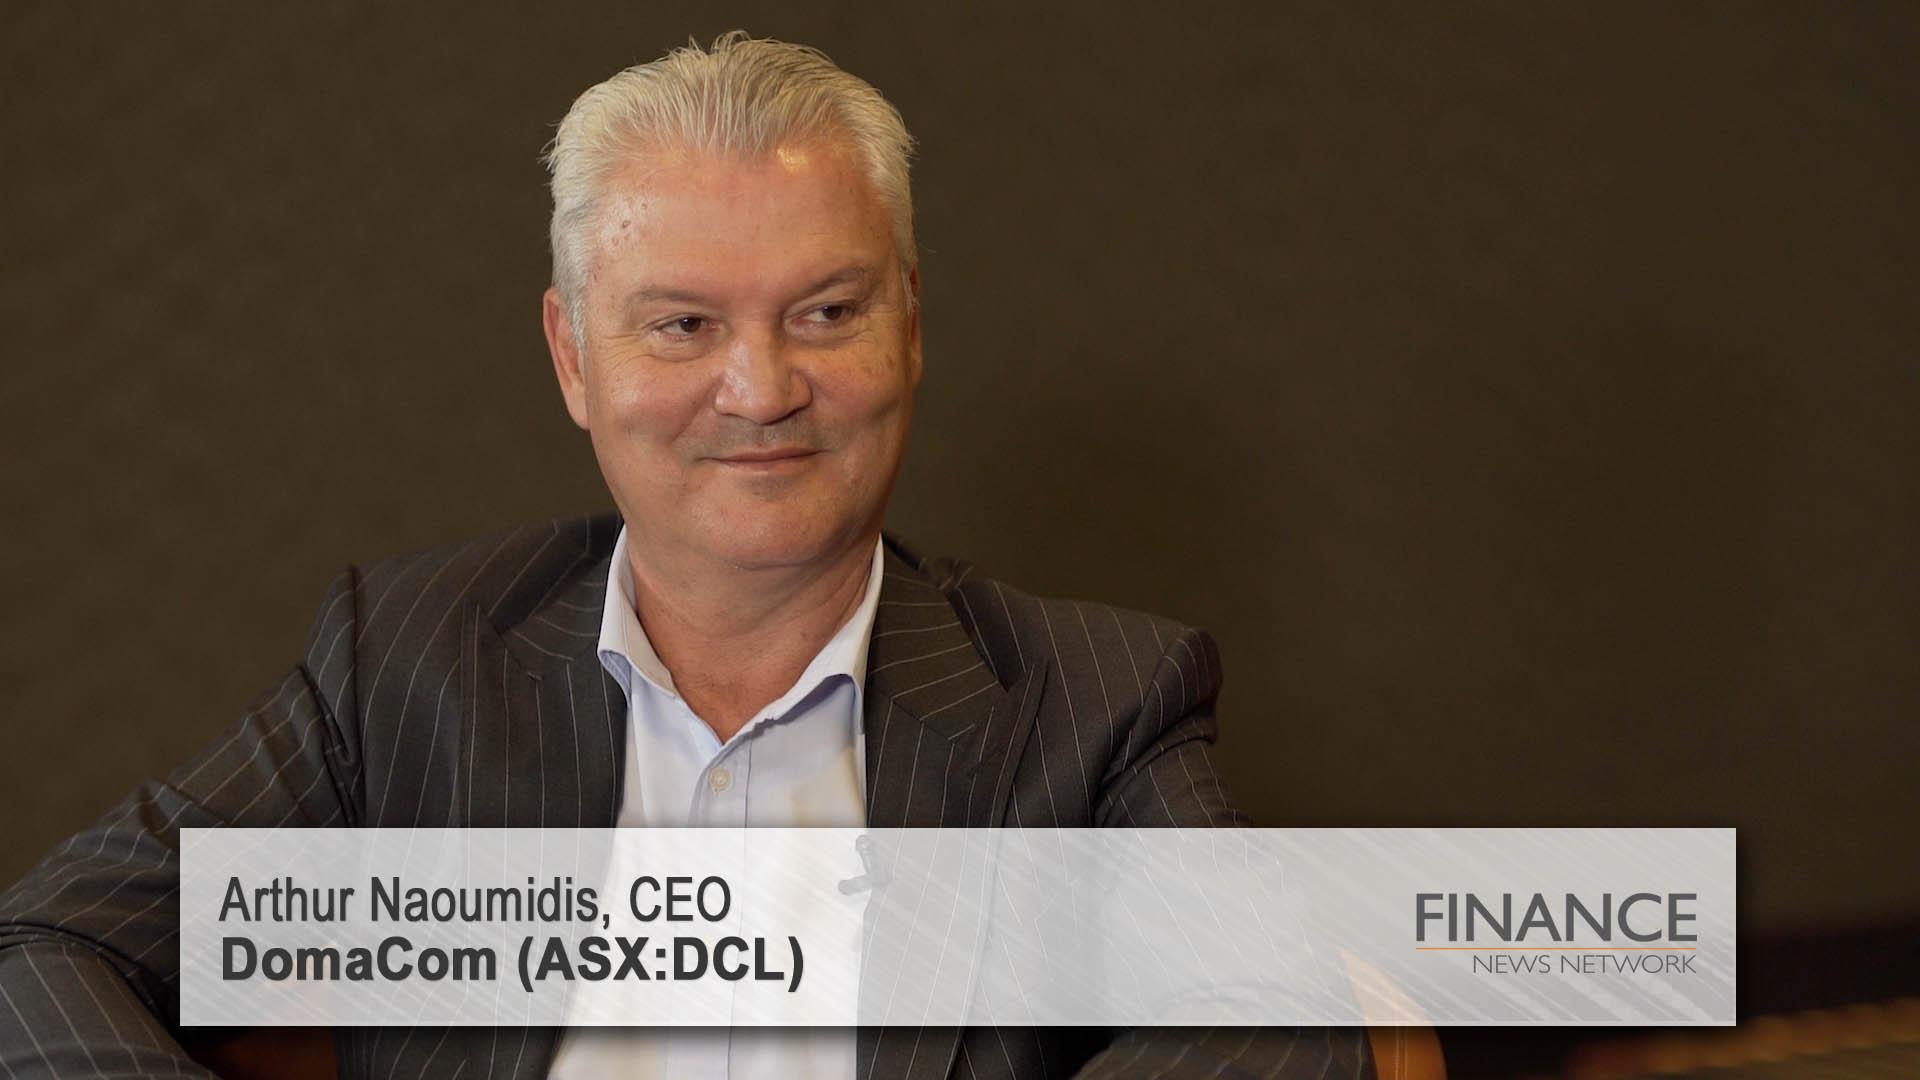 DomaCom (ASX:DCL) fractional investment platform